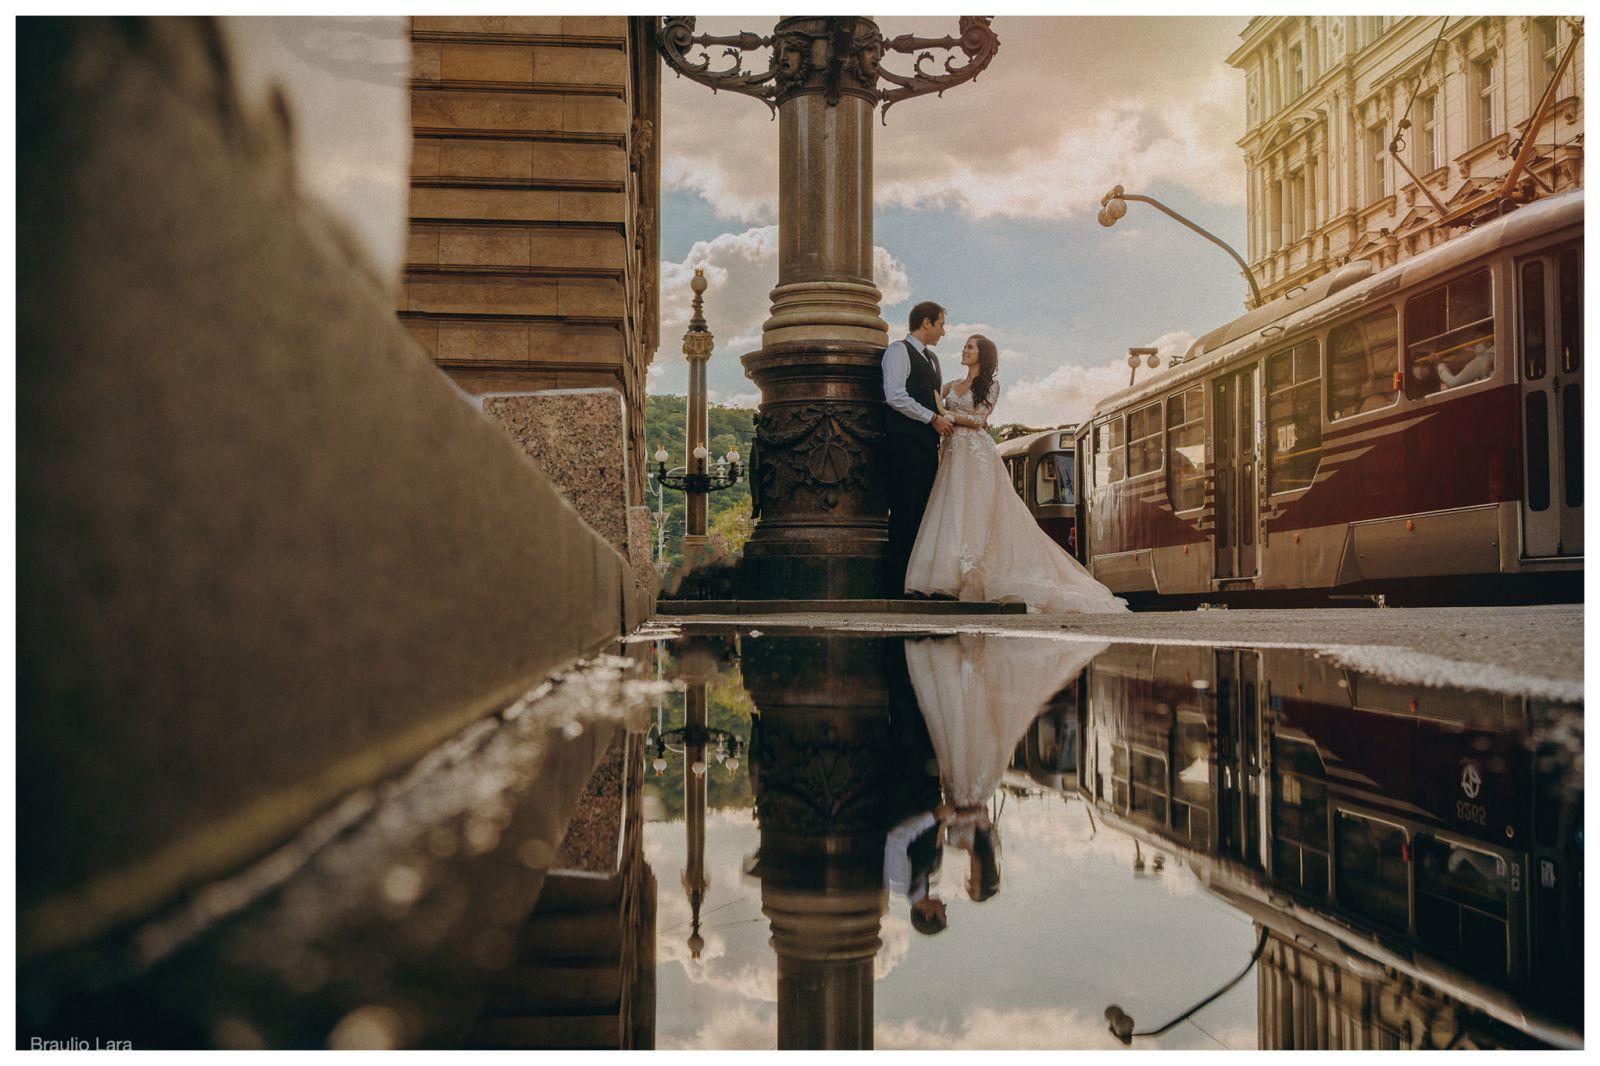 family photoshoot prague braulio lara photographer in Prague - photoshoot in prague